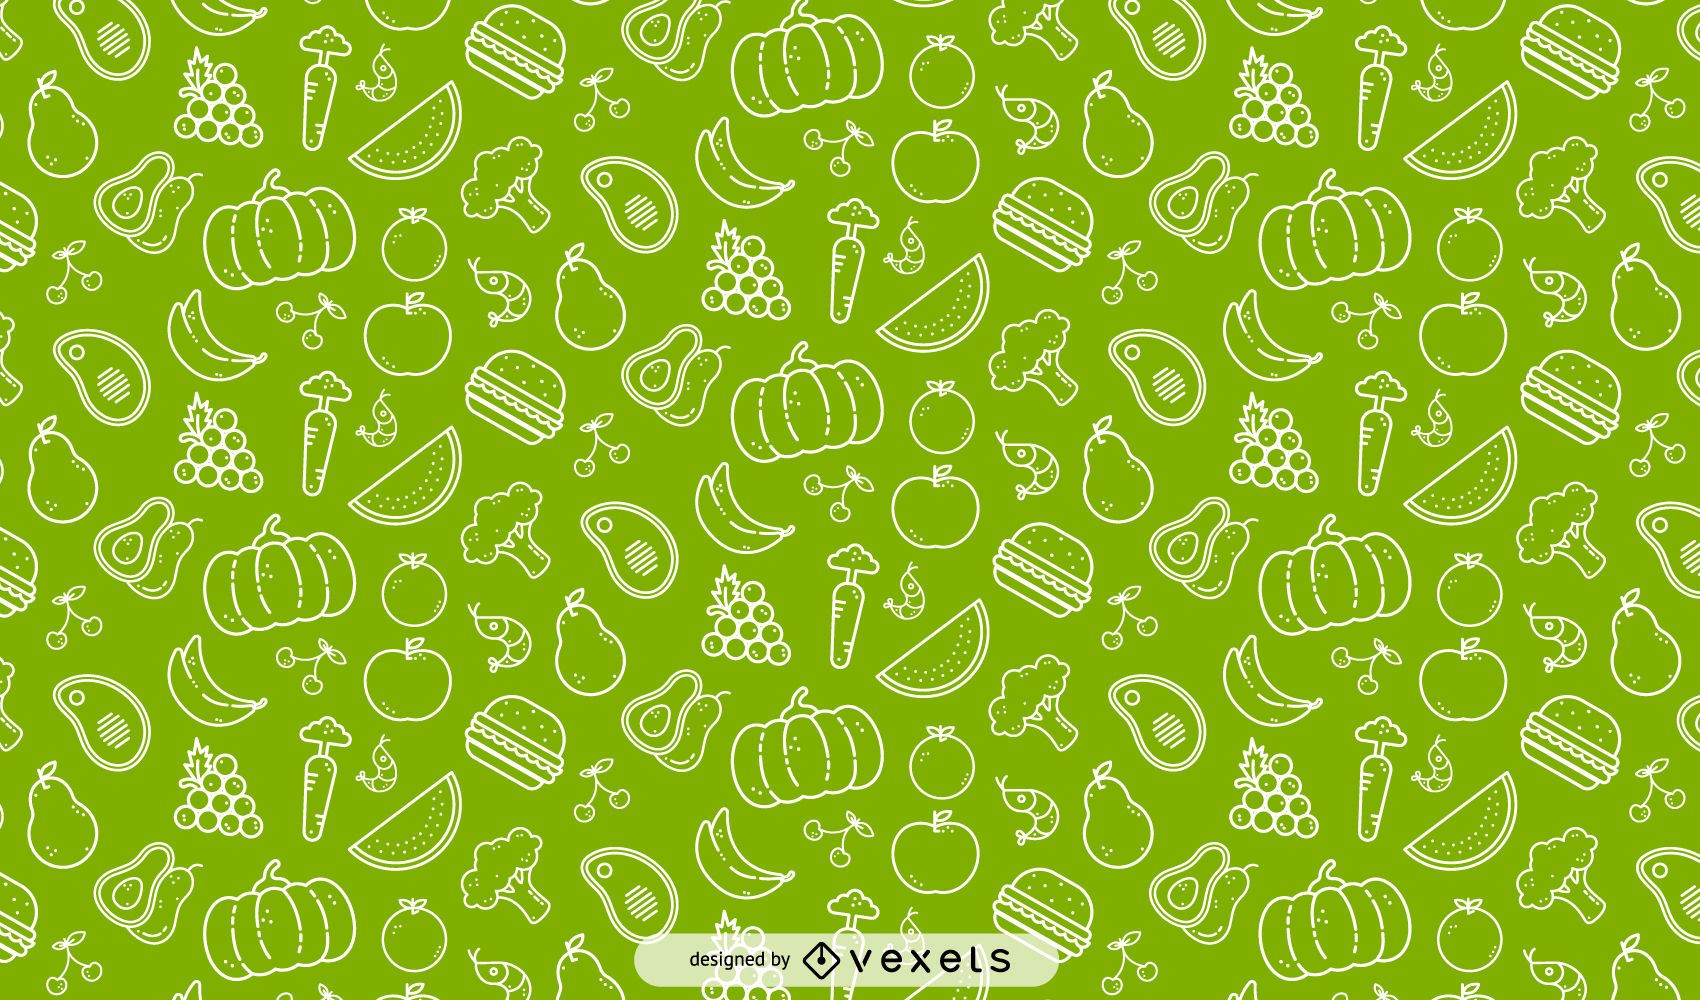 Veggies and fruits seamless pattern